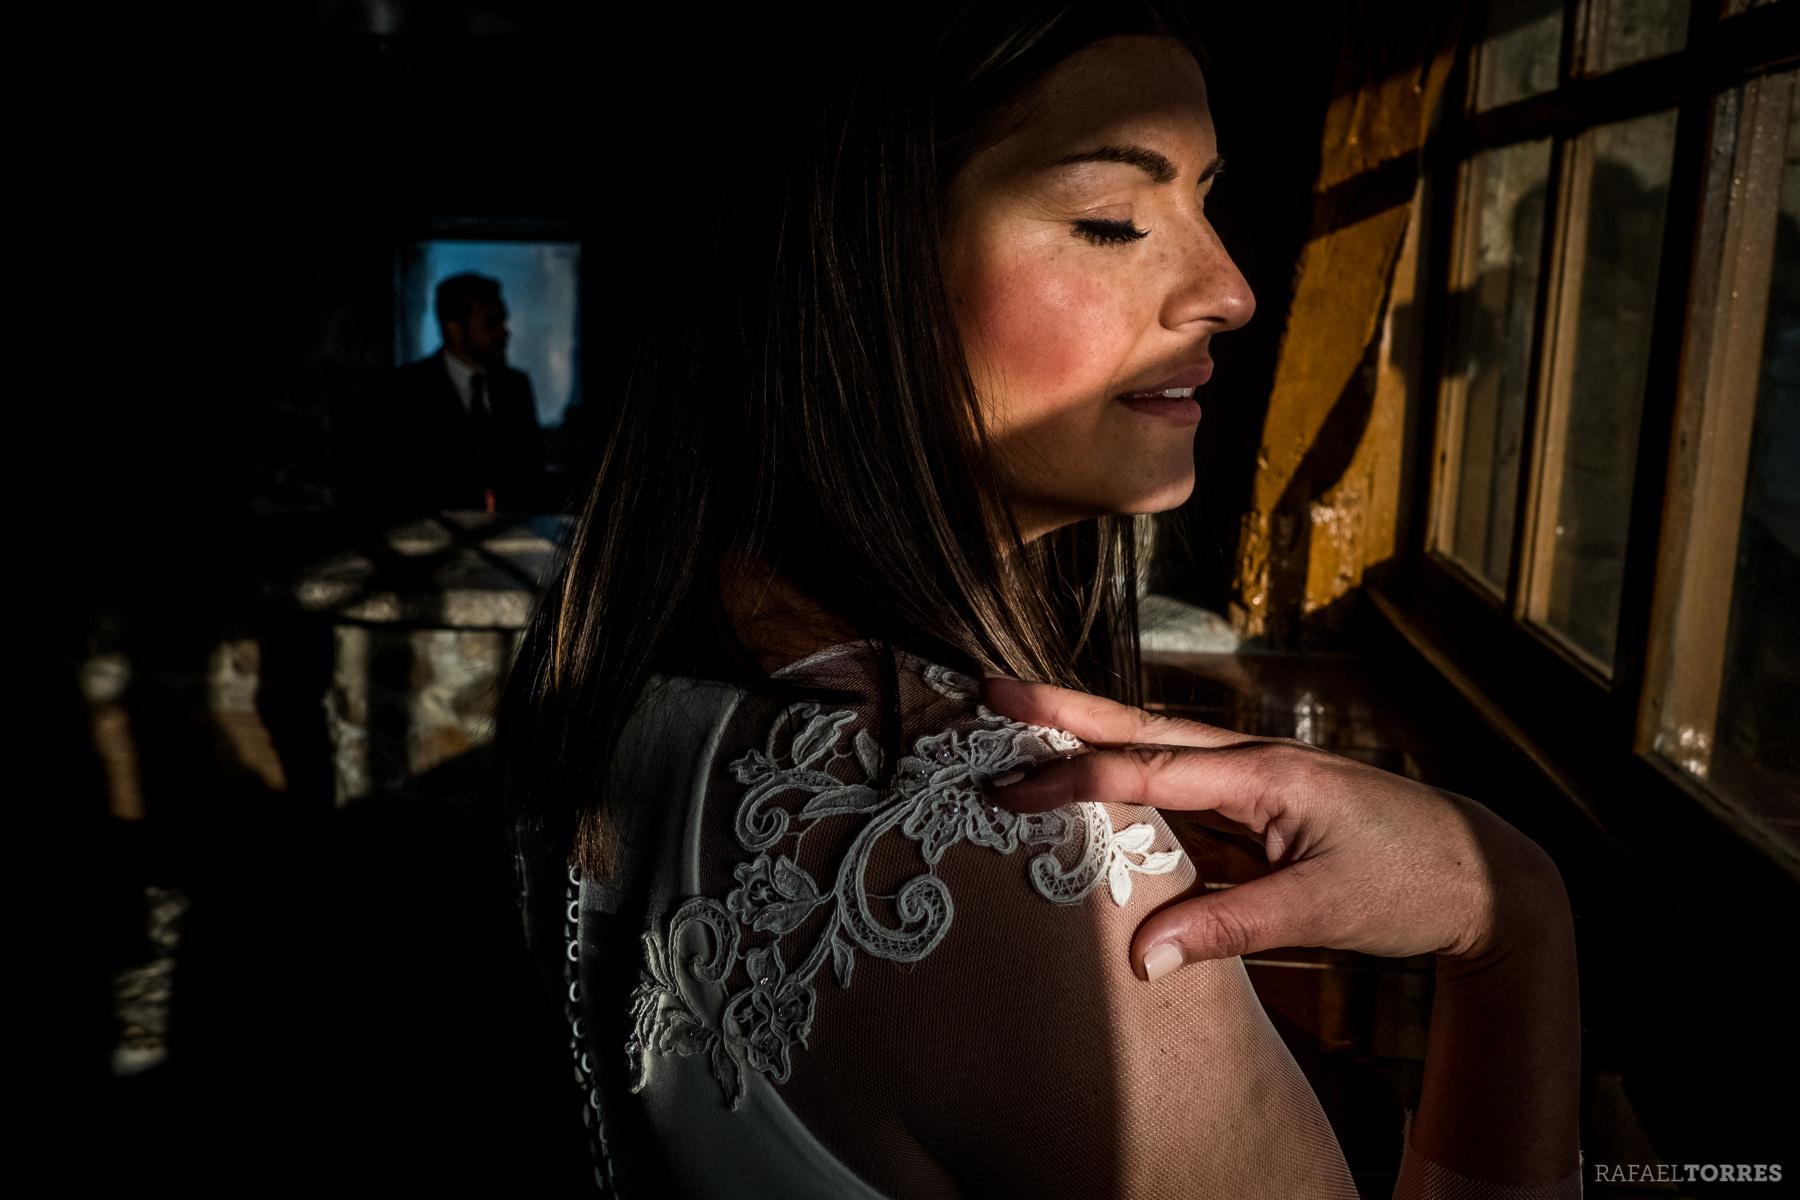 bea-juan-carmona-fotografo-boda-en-sevilla-rafael-torres-photo-66.jpg